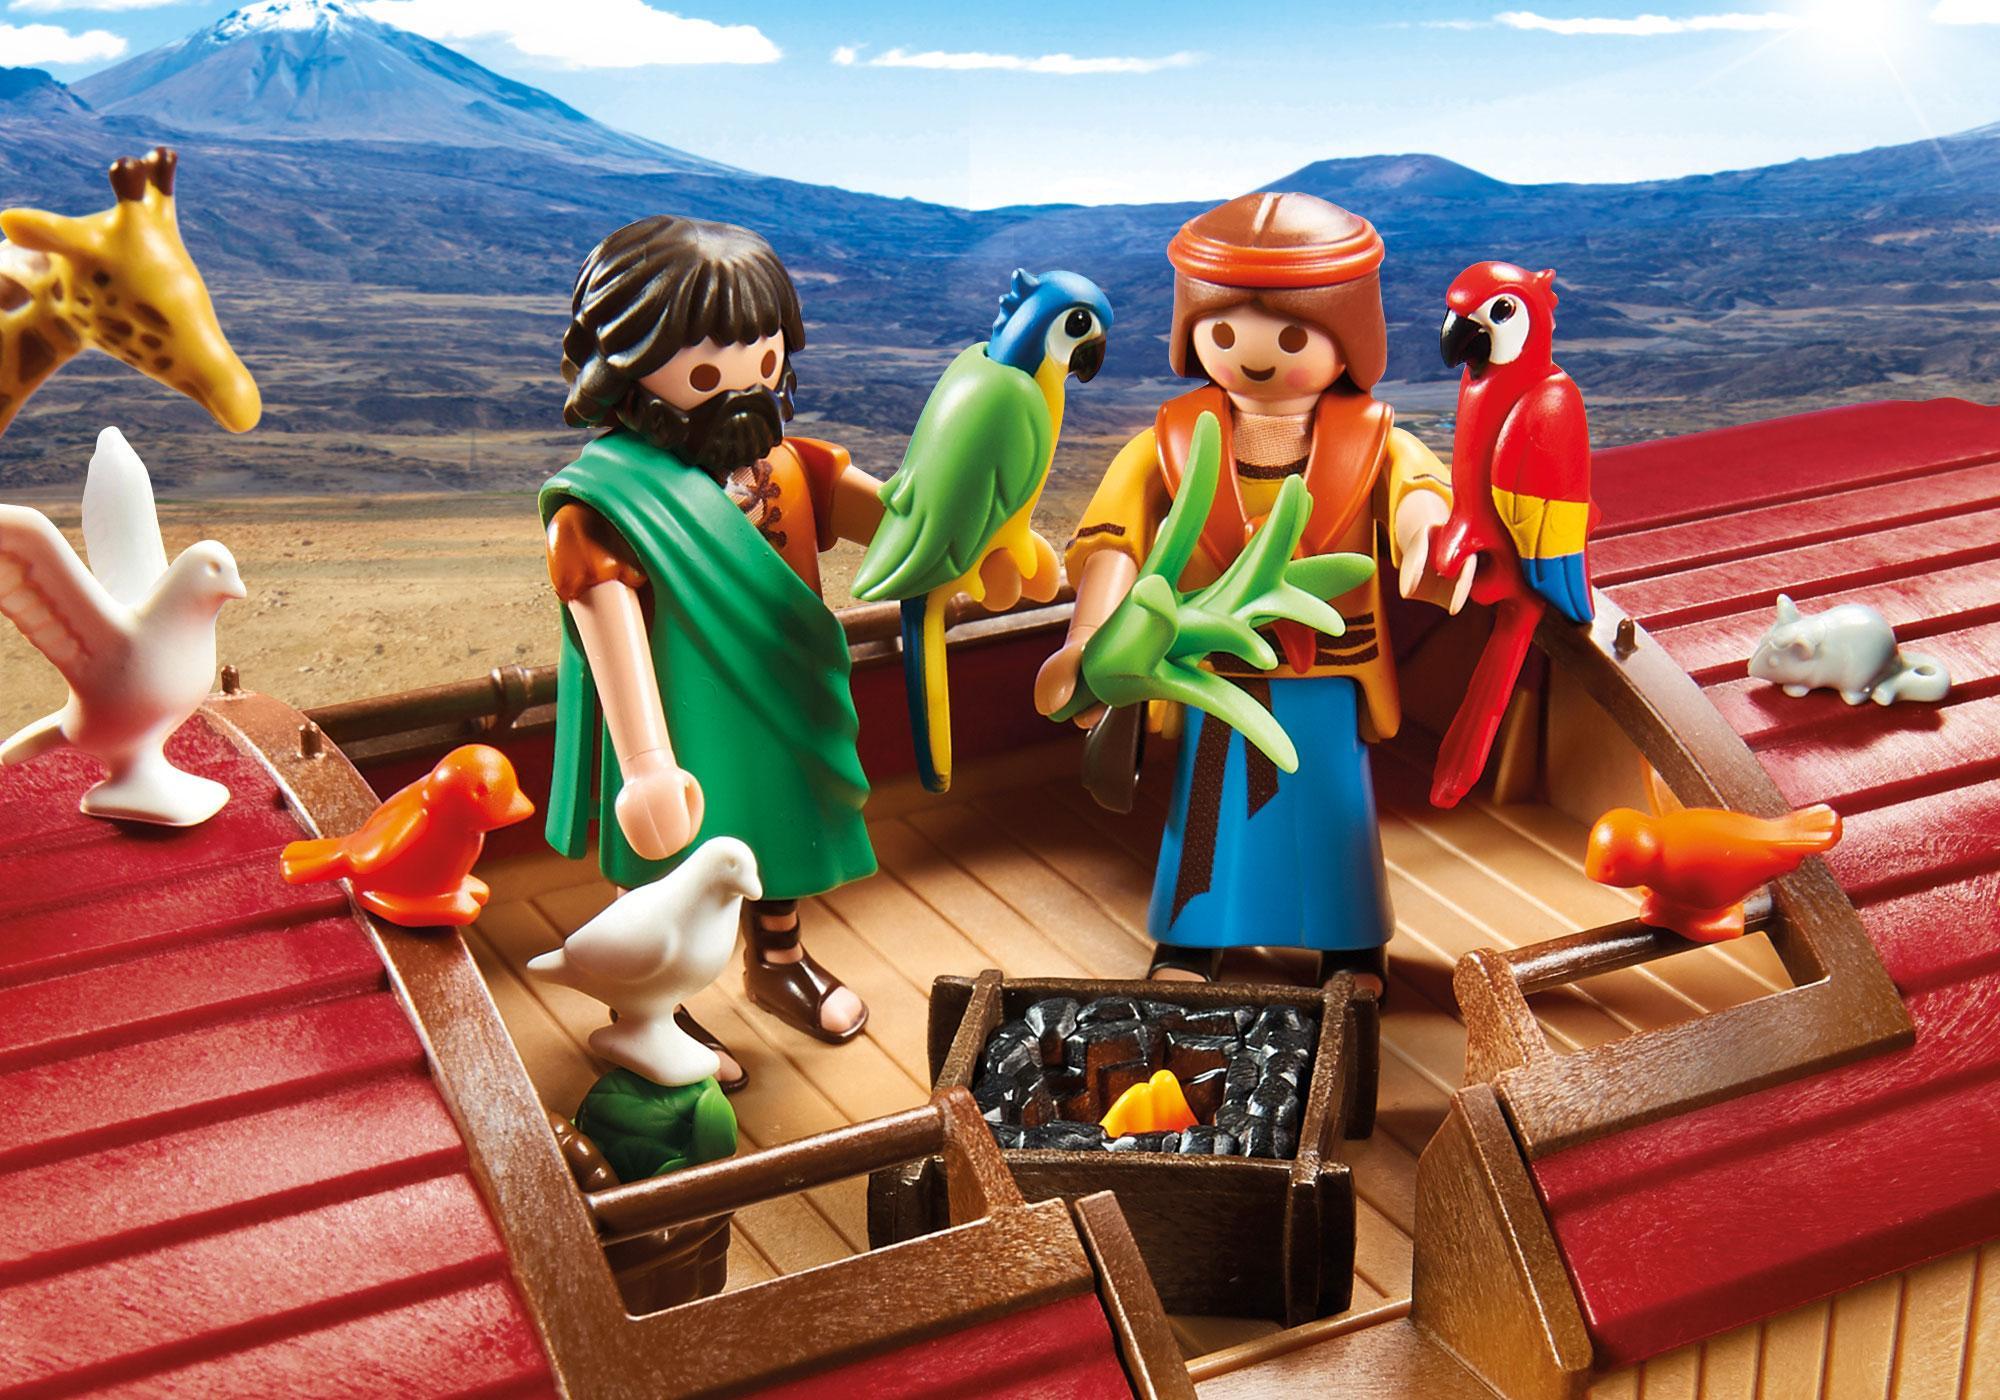 http://media.playmobil.com/i/playmobil/9373_product_extra1/Noah's Ark